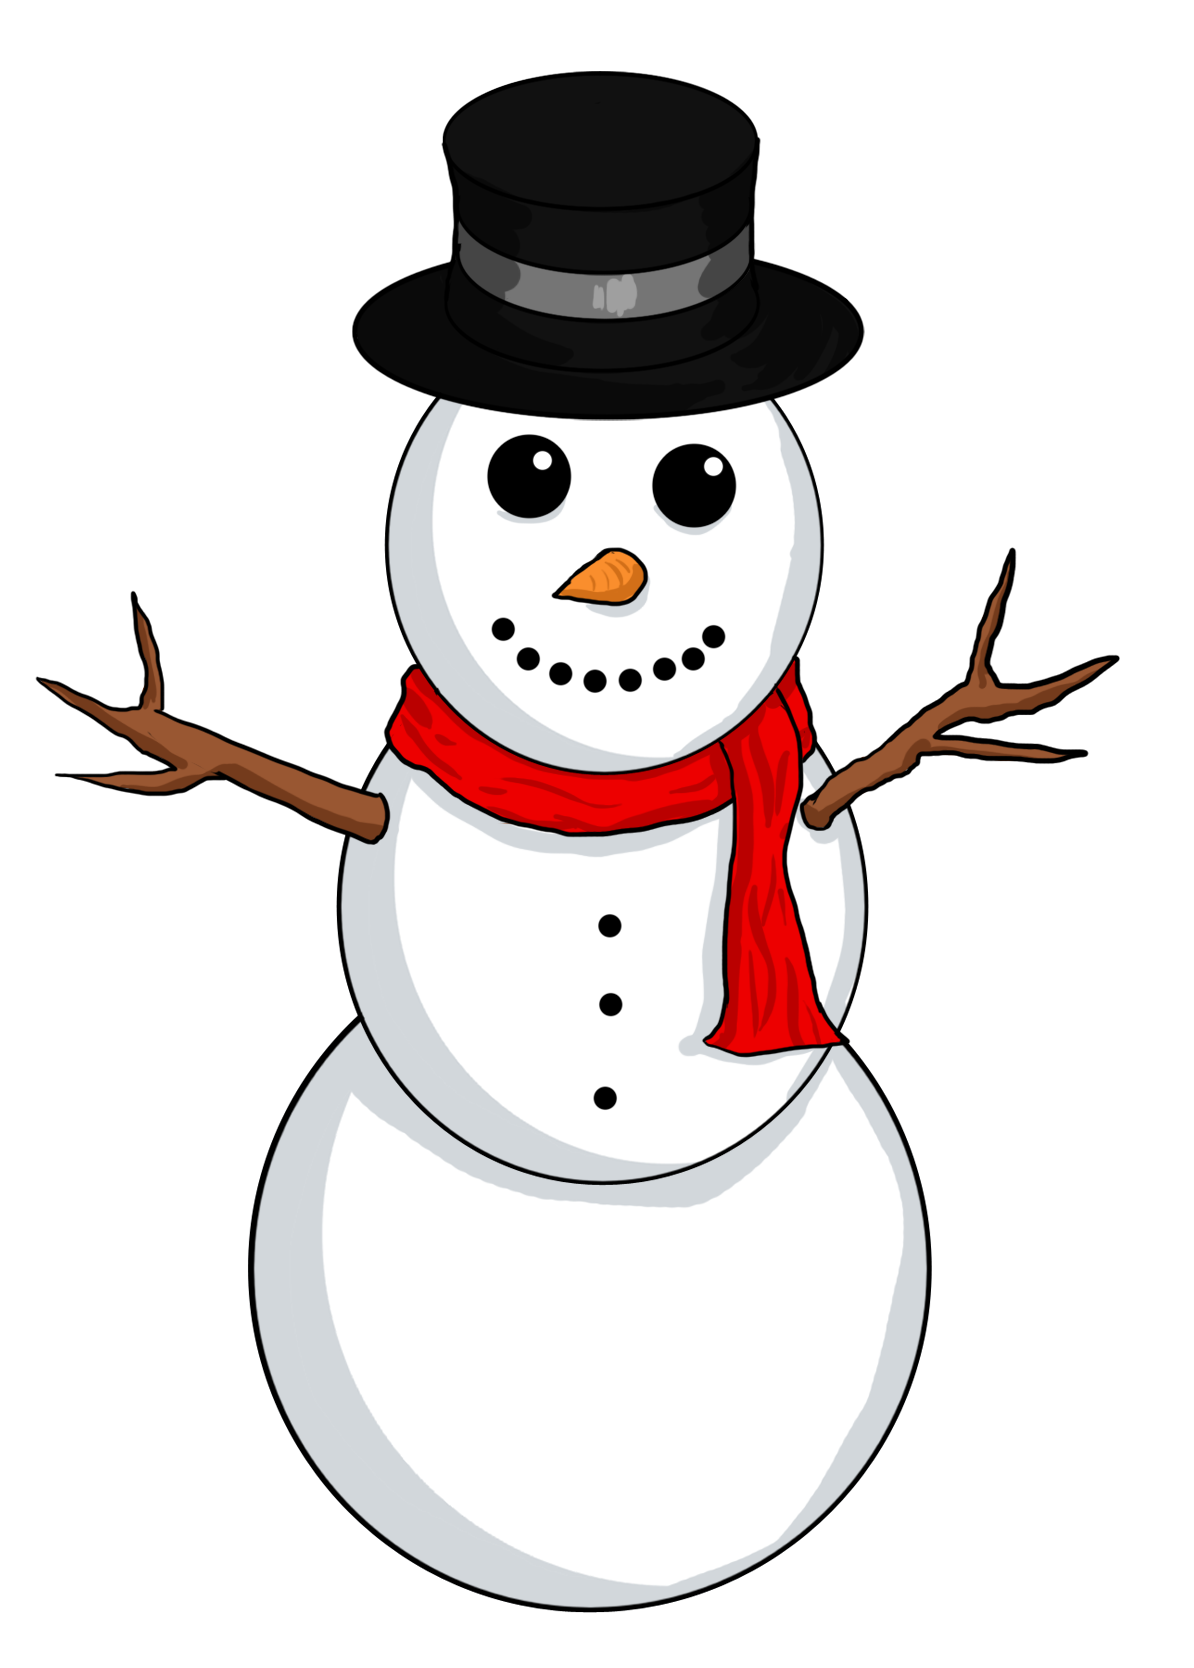 cute christmas snowman clipart free - Clipground